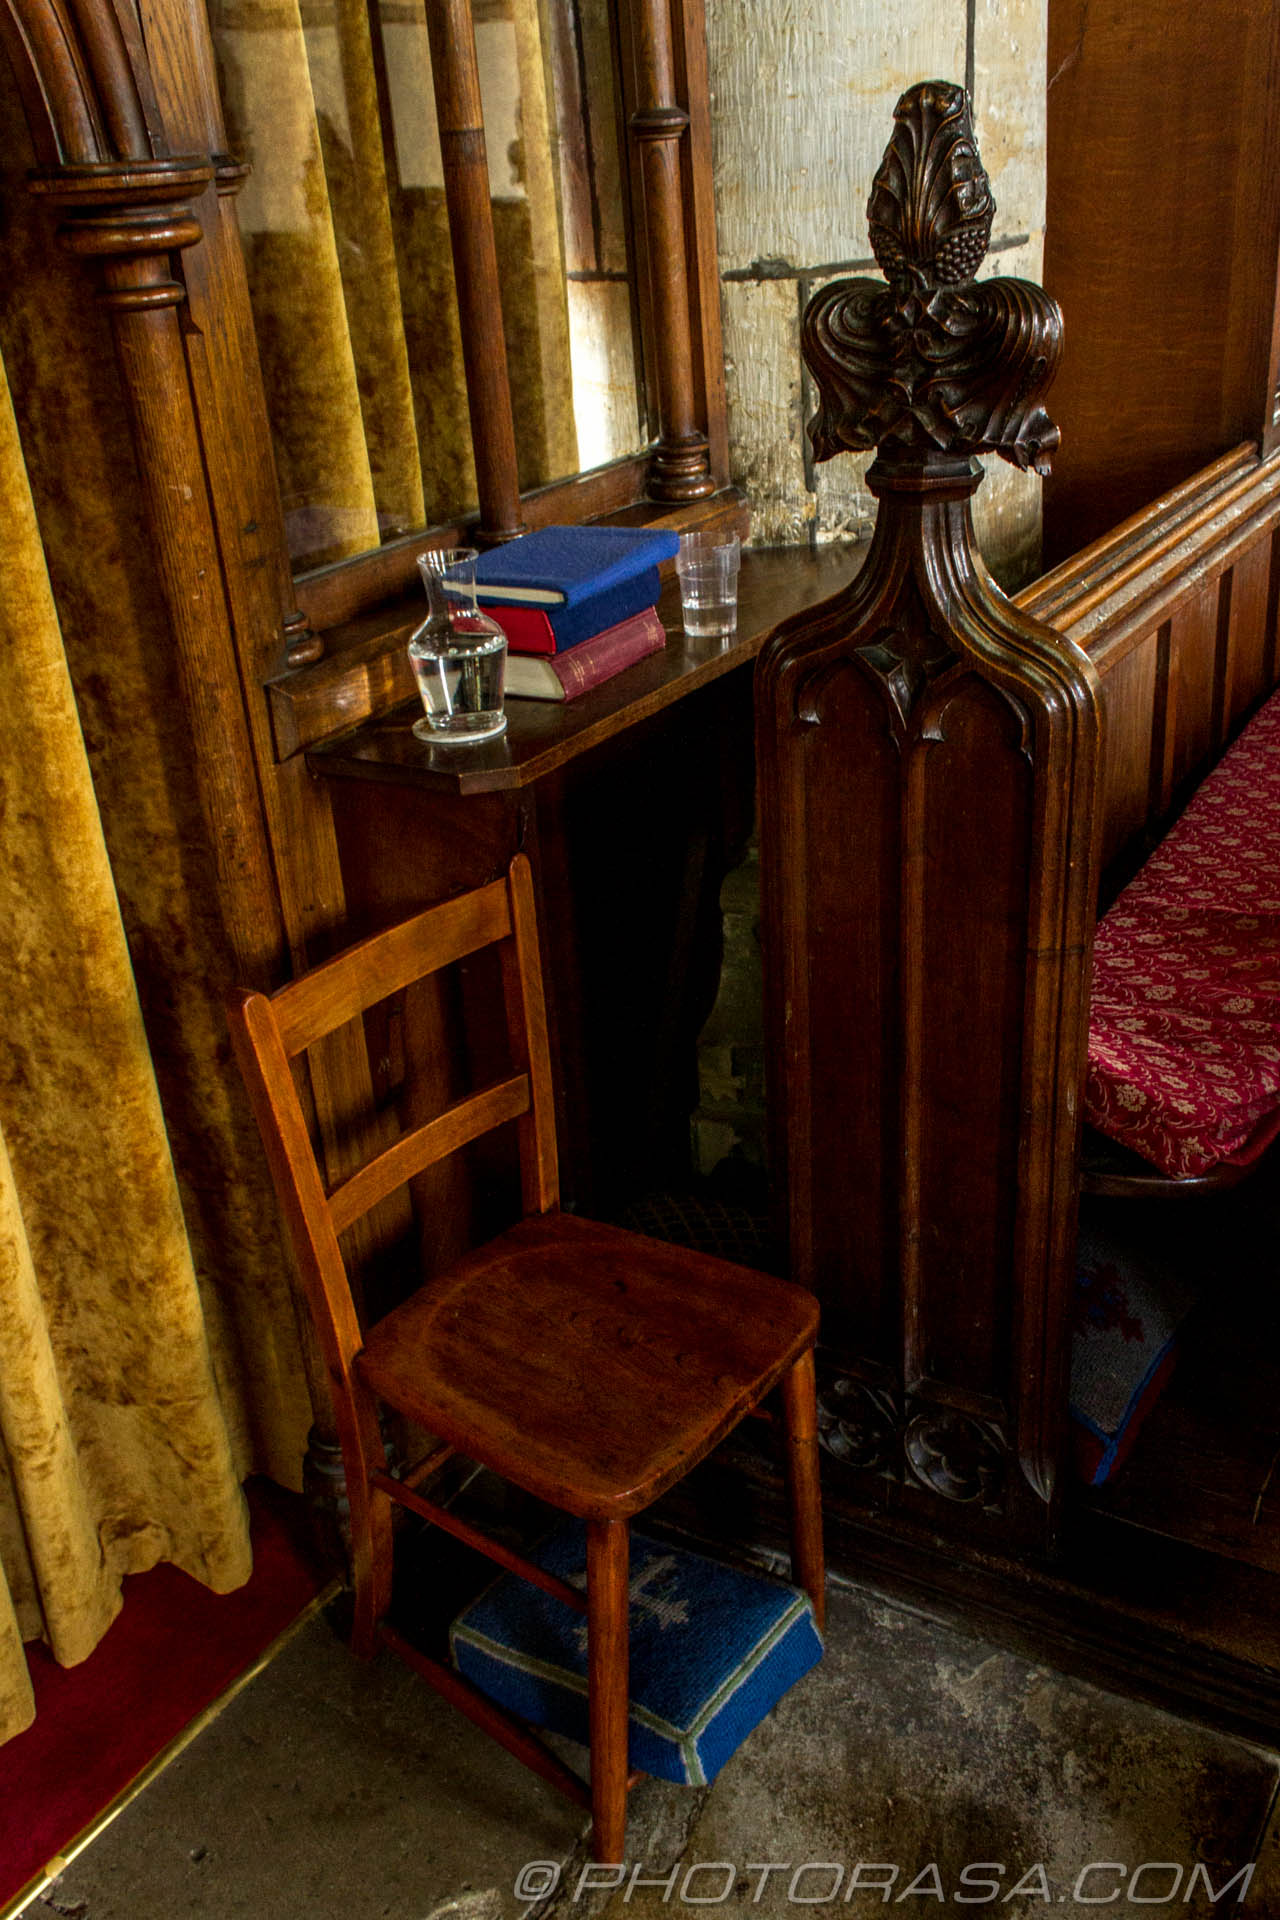 https://photorasa.com/saints-church-staplehurst-kent/water-chair-and-pew/